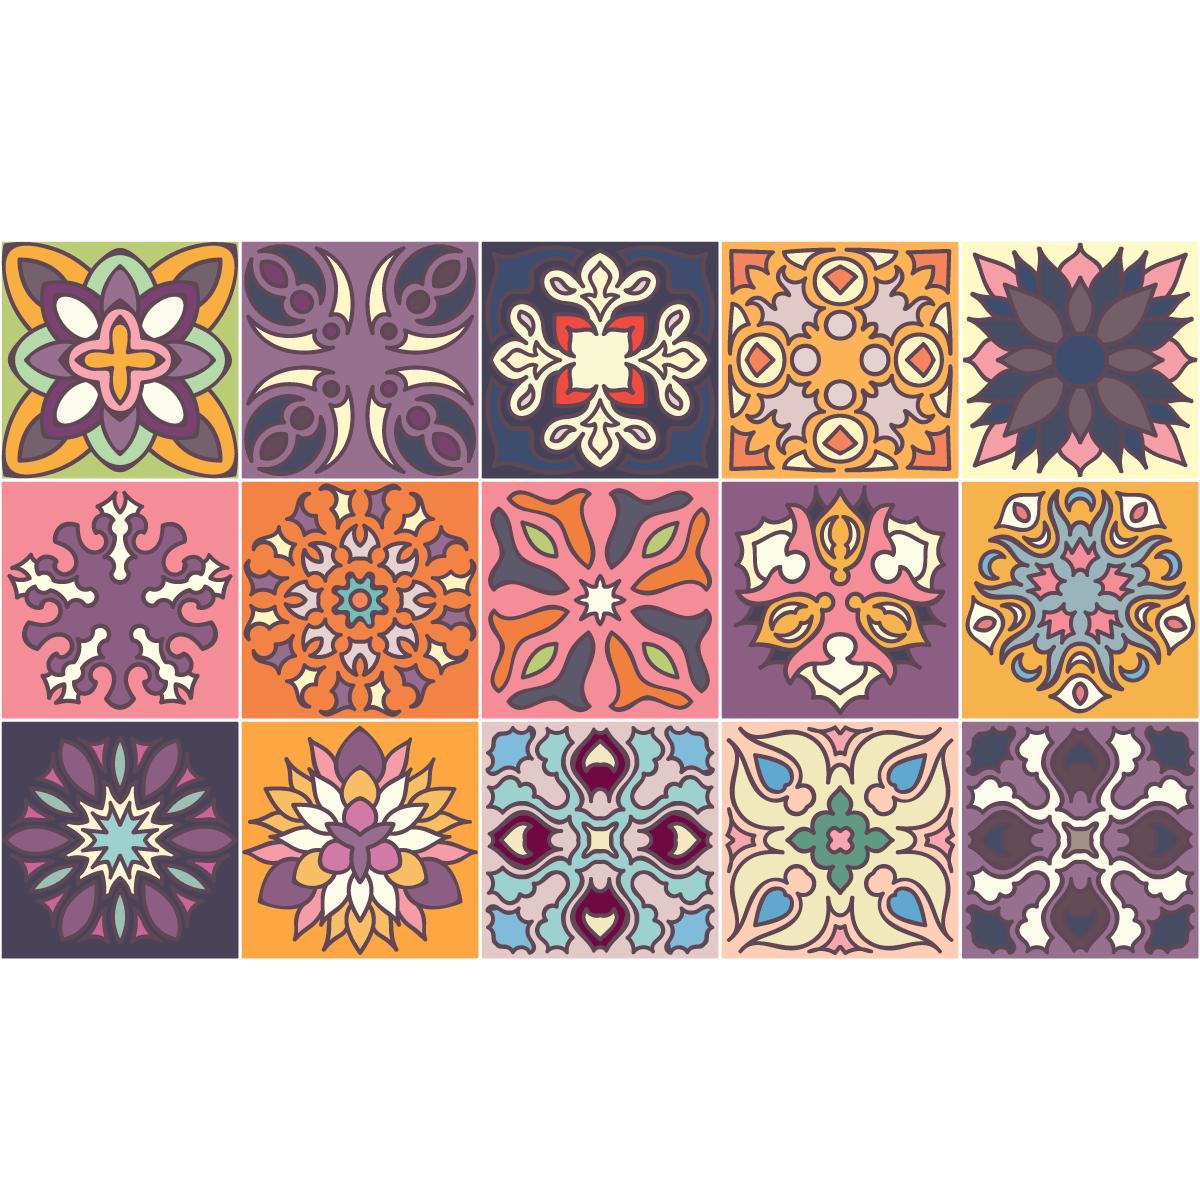 15 stickers carrelages azulejos marbella cuisine. Black Bedroom Furniture Sets. Home Design Ideas